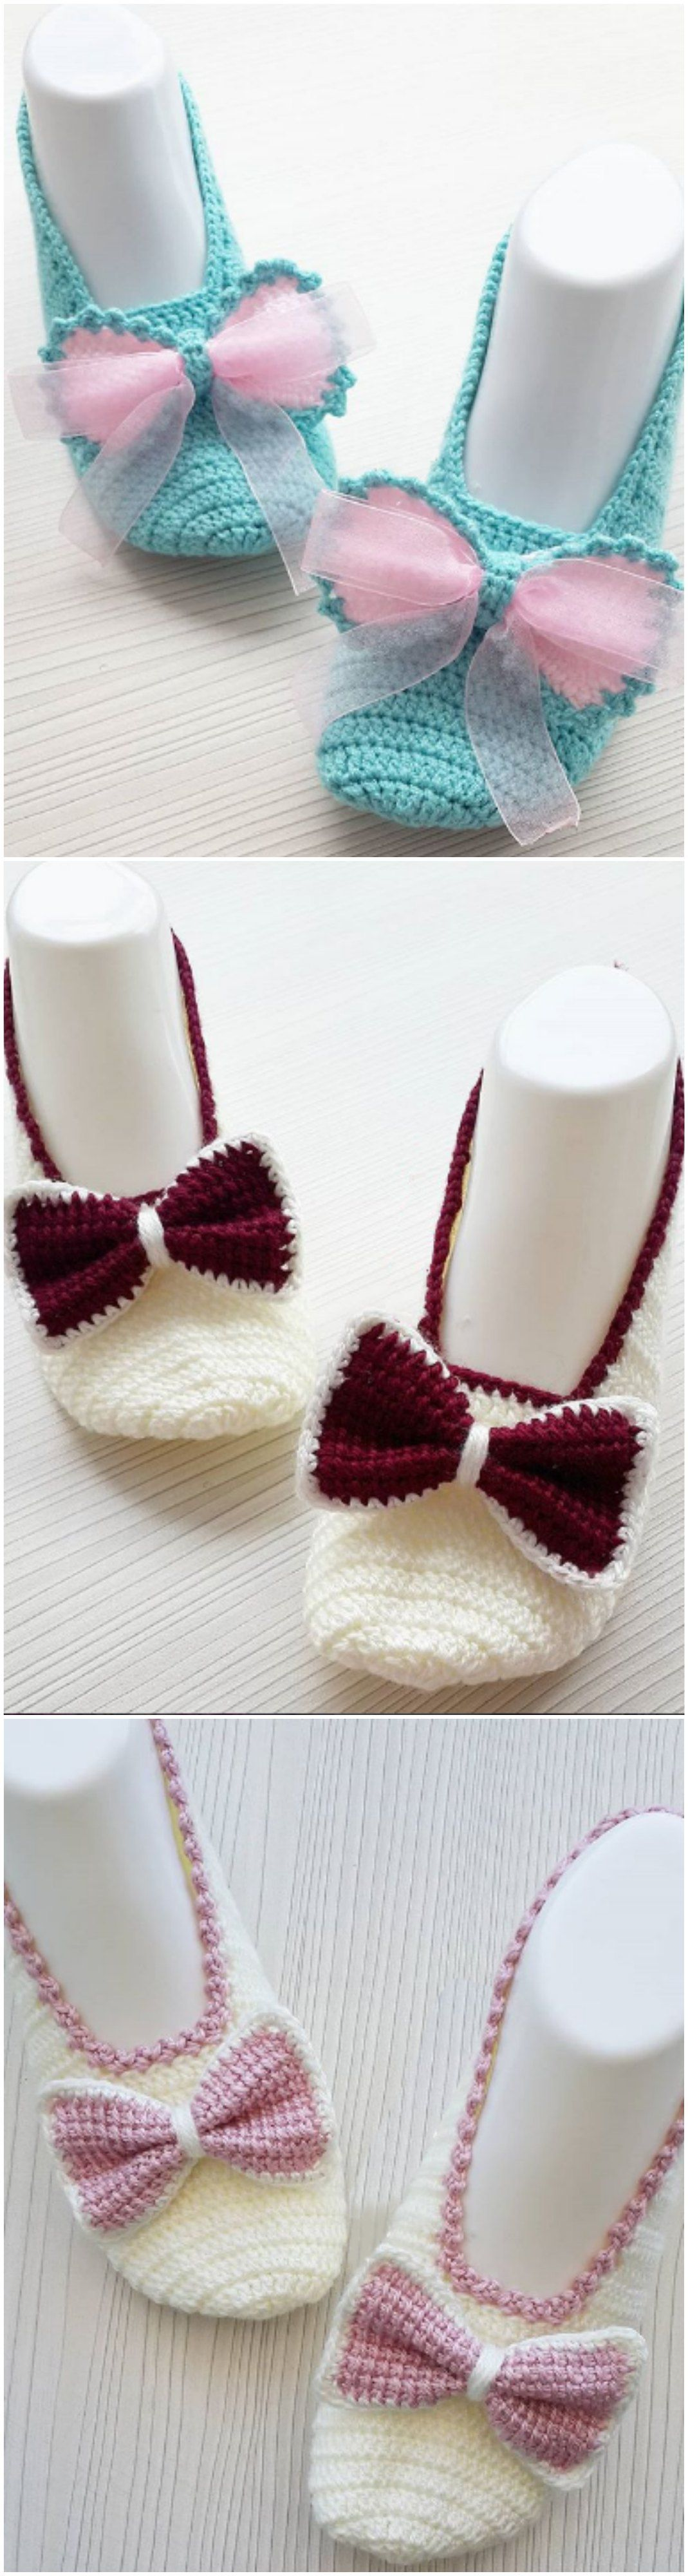 Crochet Bow Slippers | crochet | Pinterest | Ganchillo, Croché and ...